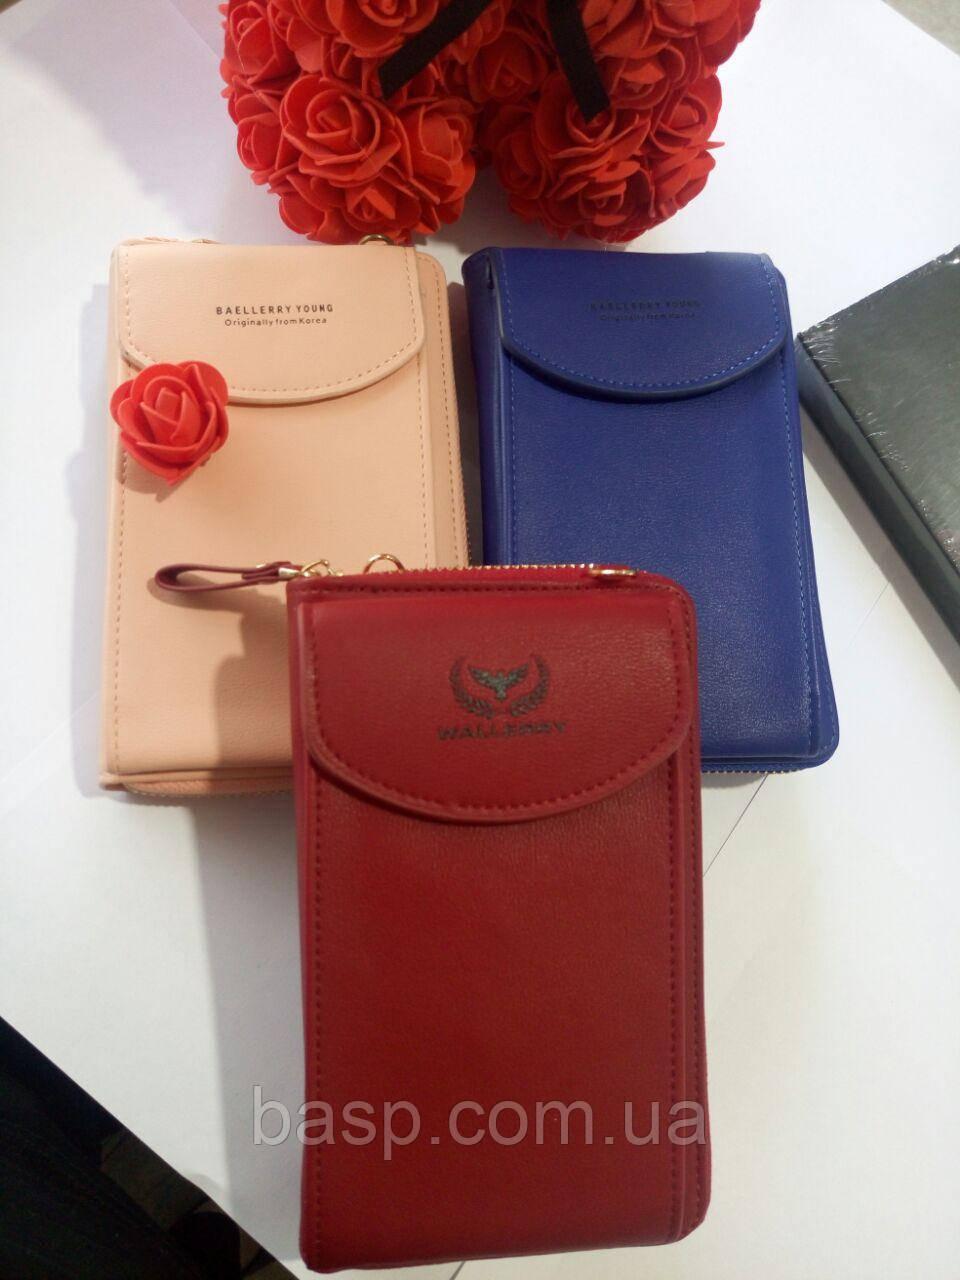 bca54b37f566 Женский кошелек - сумочка Baellerry YOUNG 5802(красная, синяя, персик)